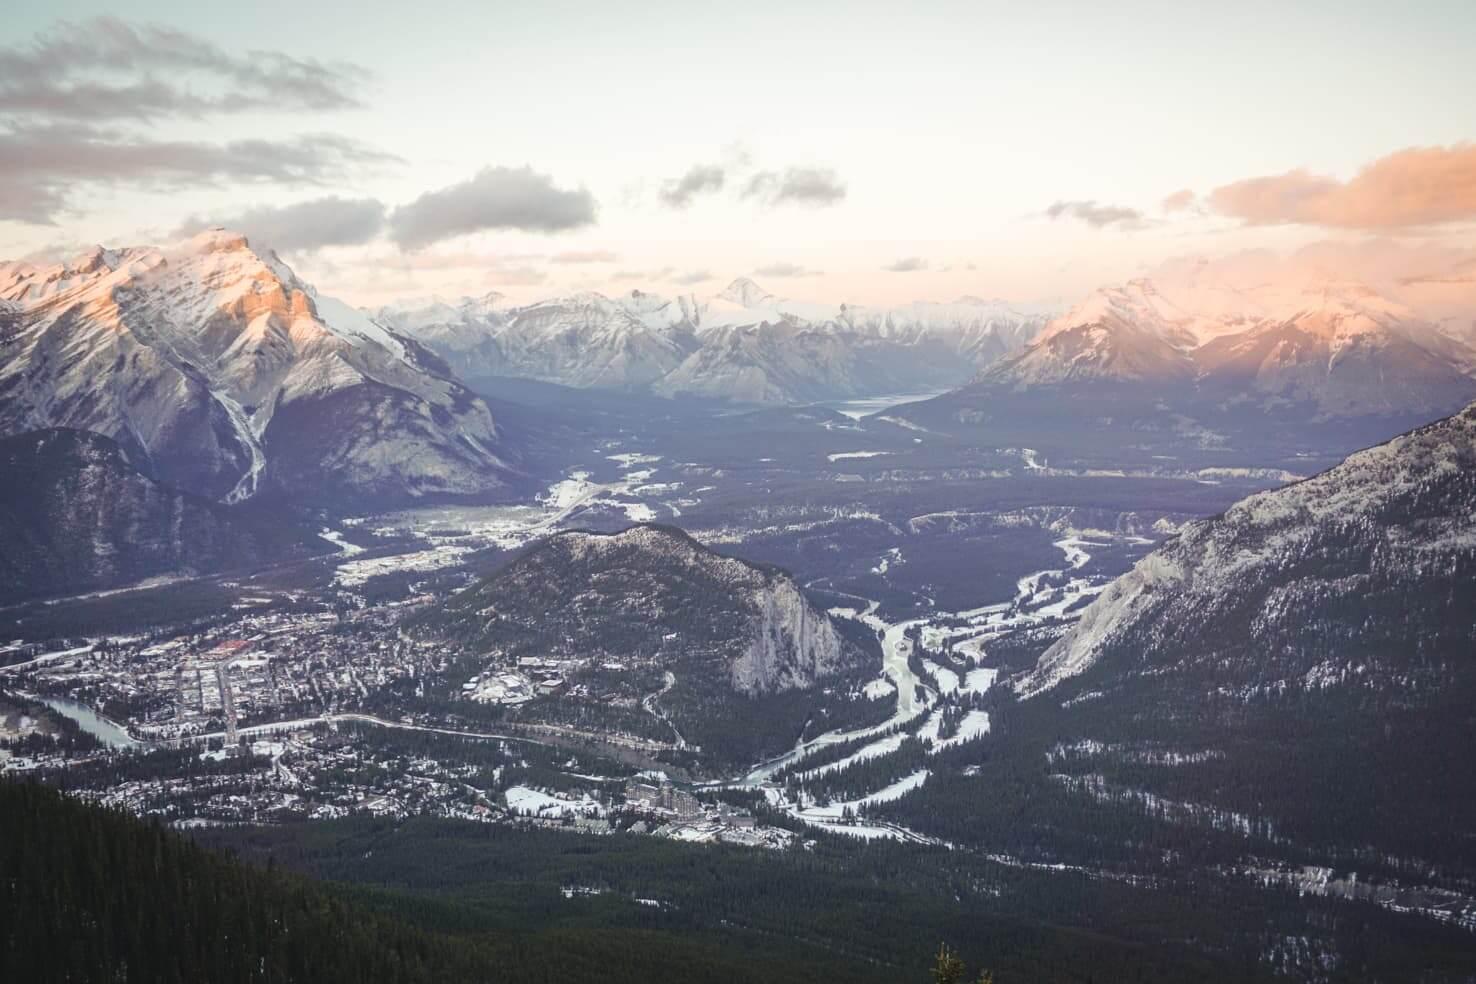 Sulphur Mountain Hike, Banff National Park